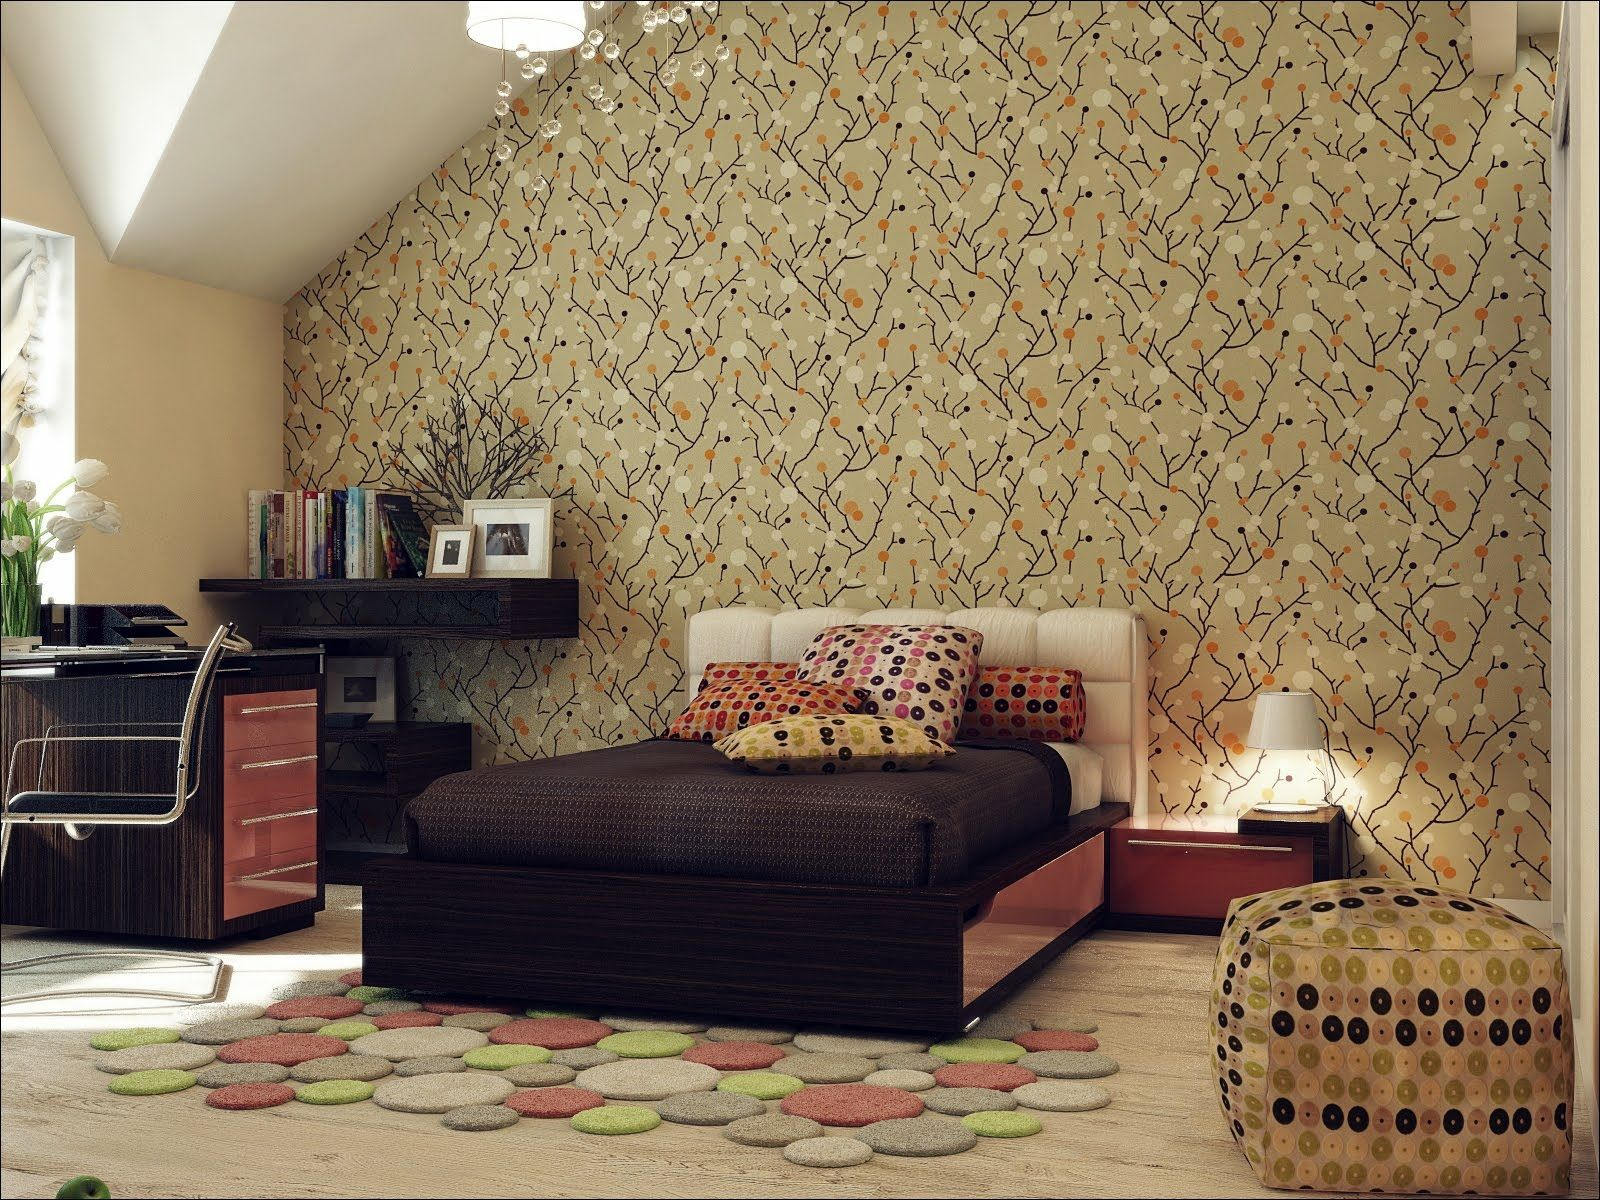 Attic Spaces | Home Decor | Wallpaper design for bedroom ...